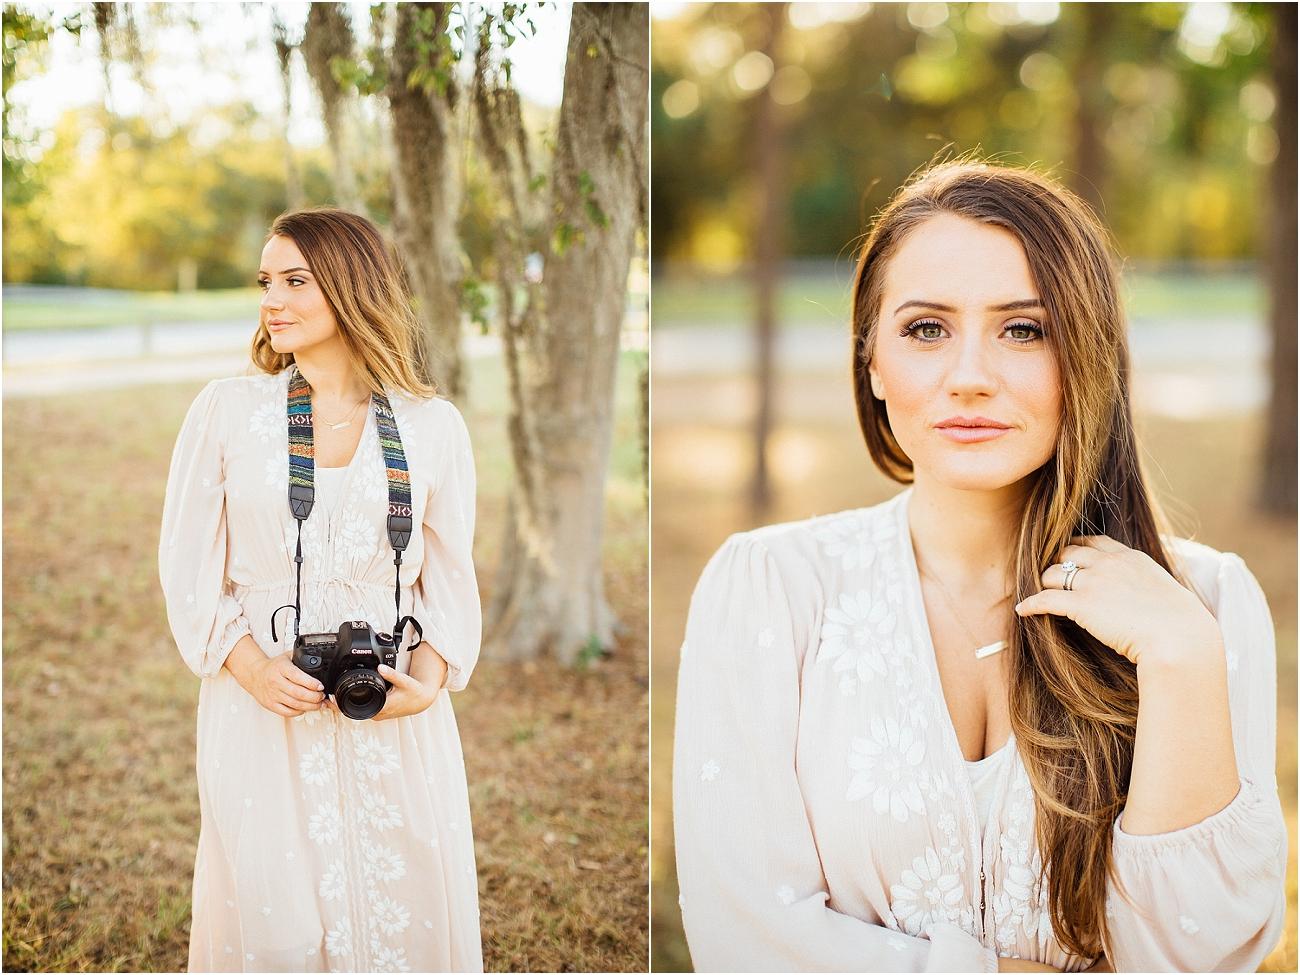 Houston Spring TX Outdoor Senior Portrait Session